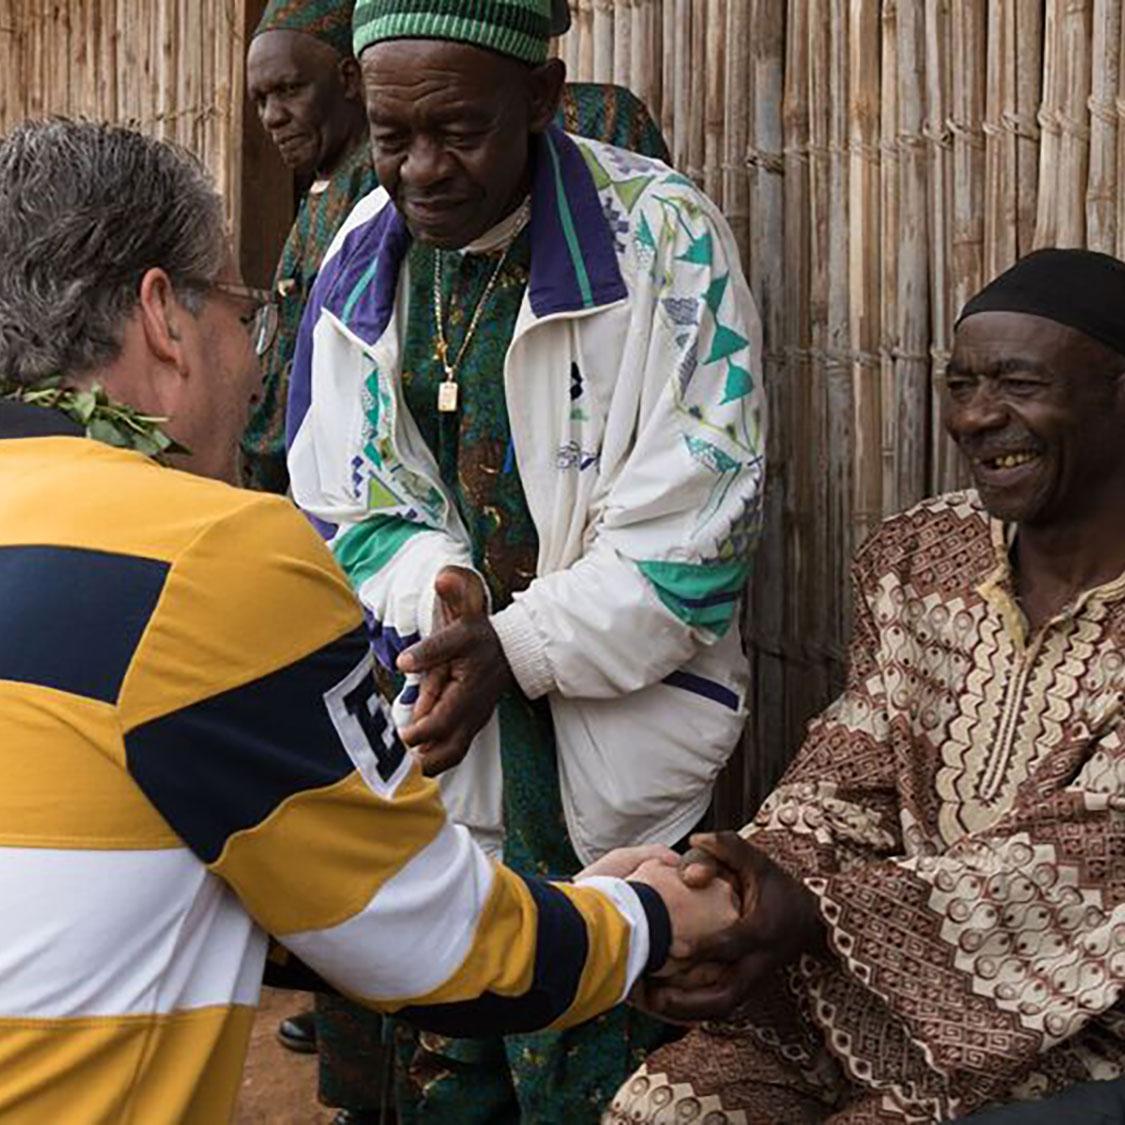 cdvta-village-elders